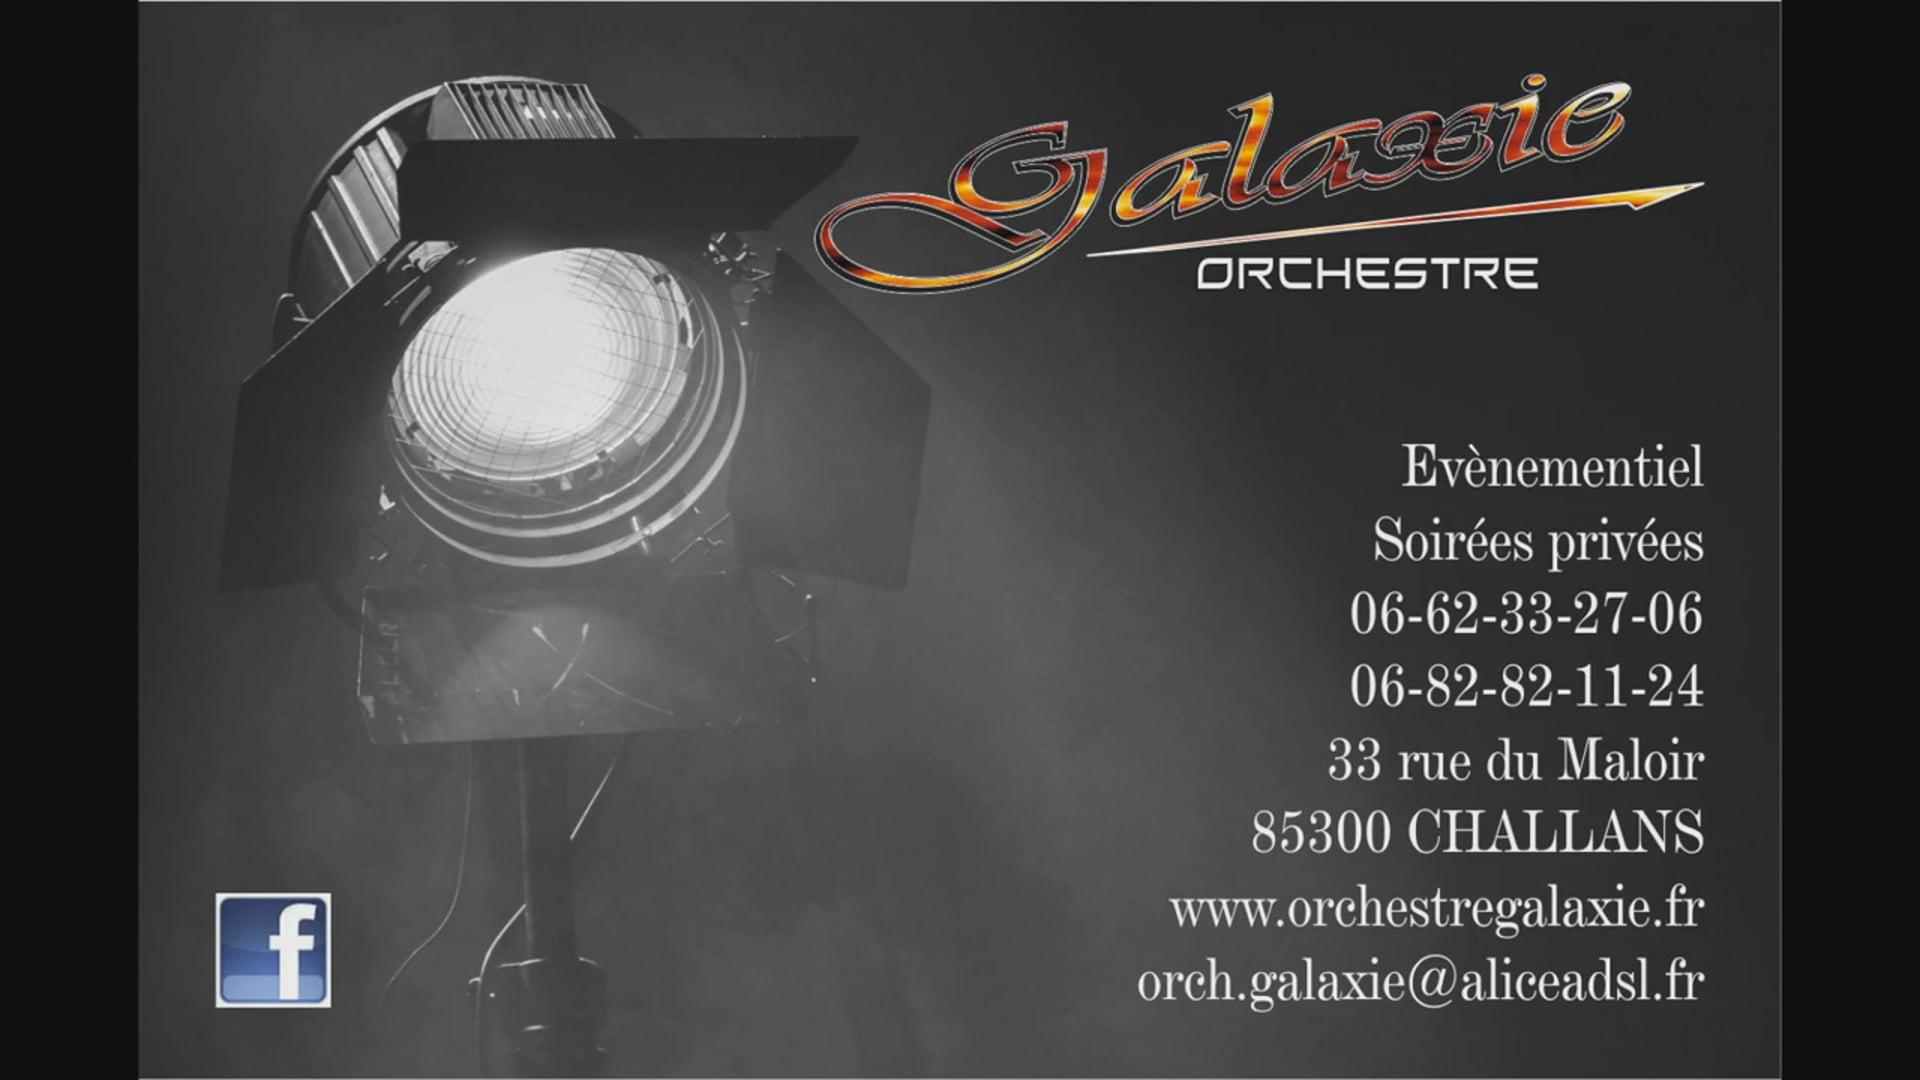 Jingle Orchestre Galaxie 2